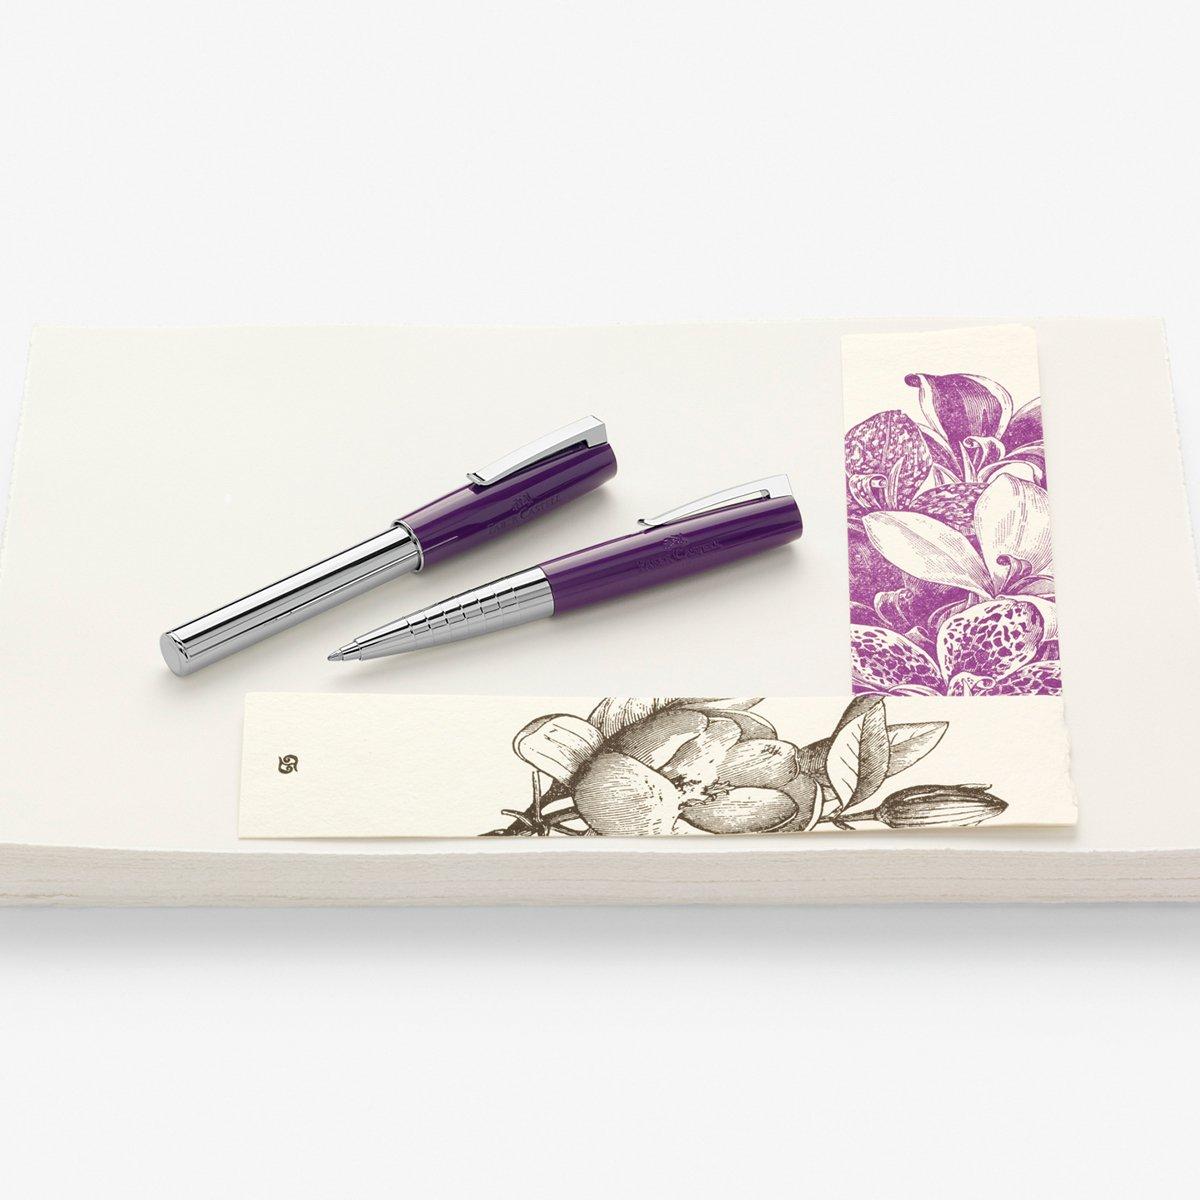 /Penna stilografica Loom Piano Penna stilografica B bianco Faber-Castell 149250/